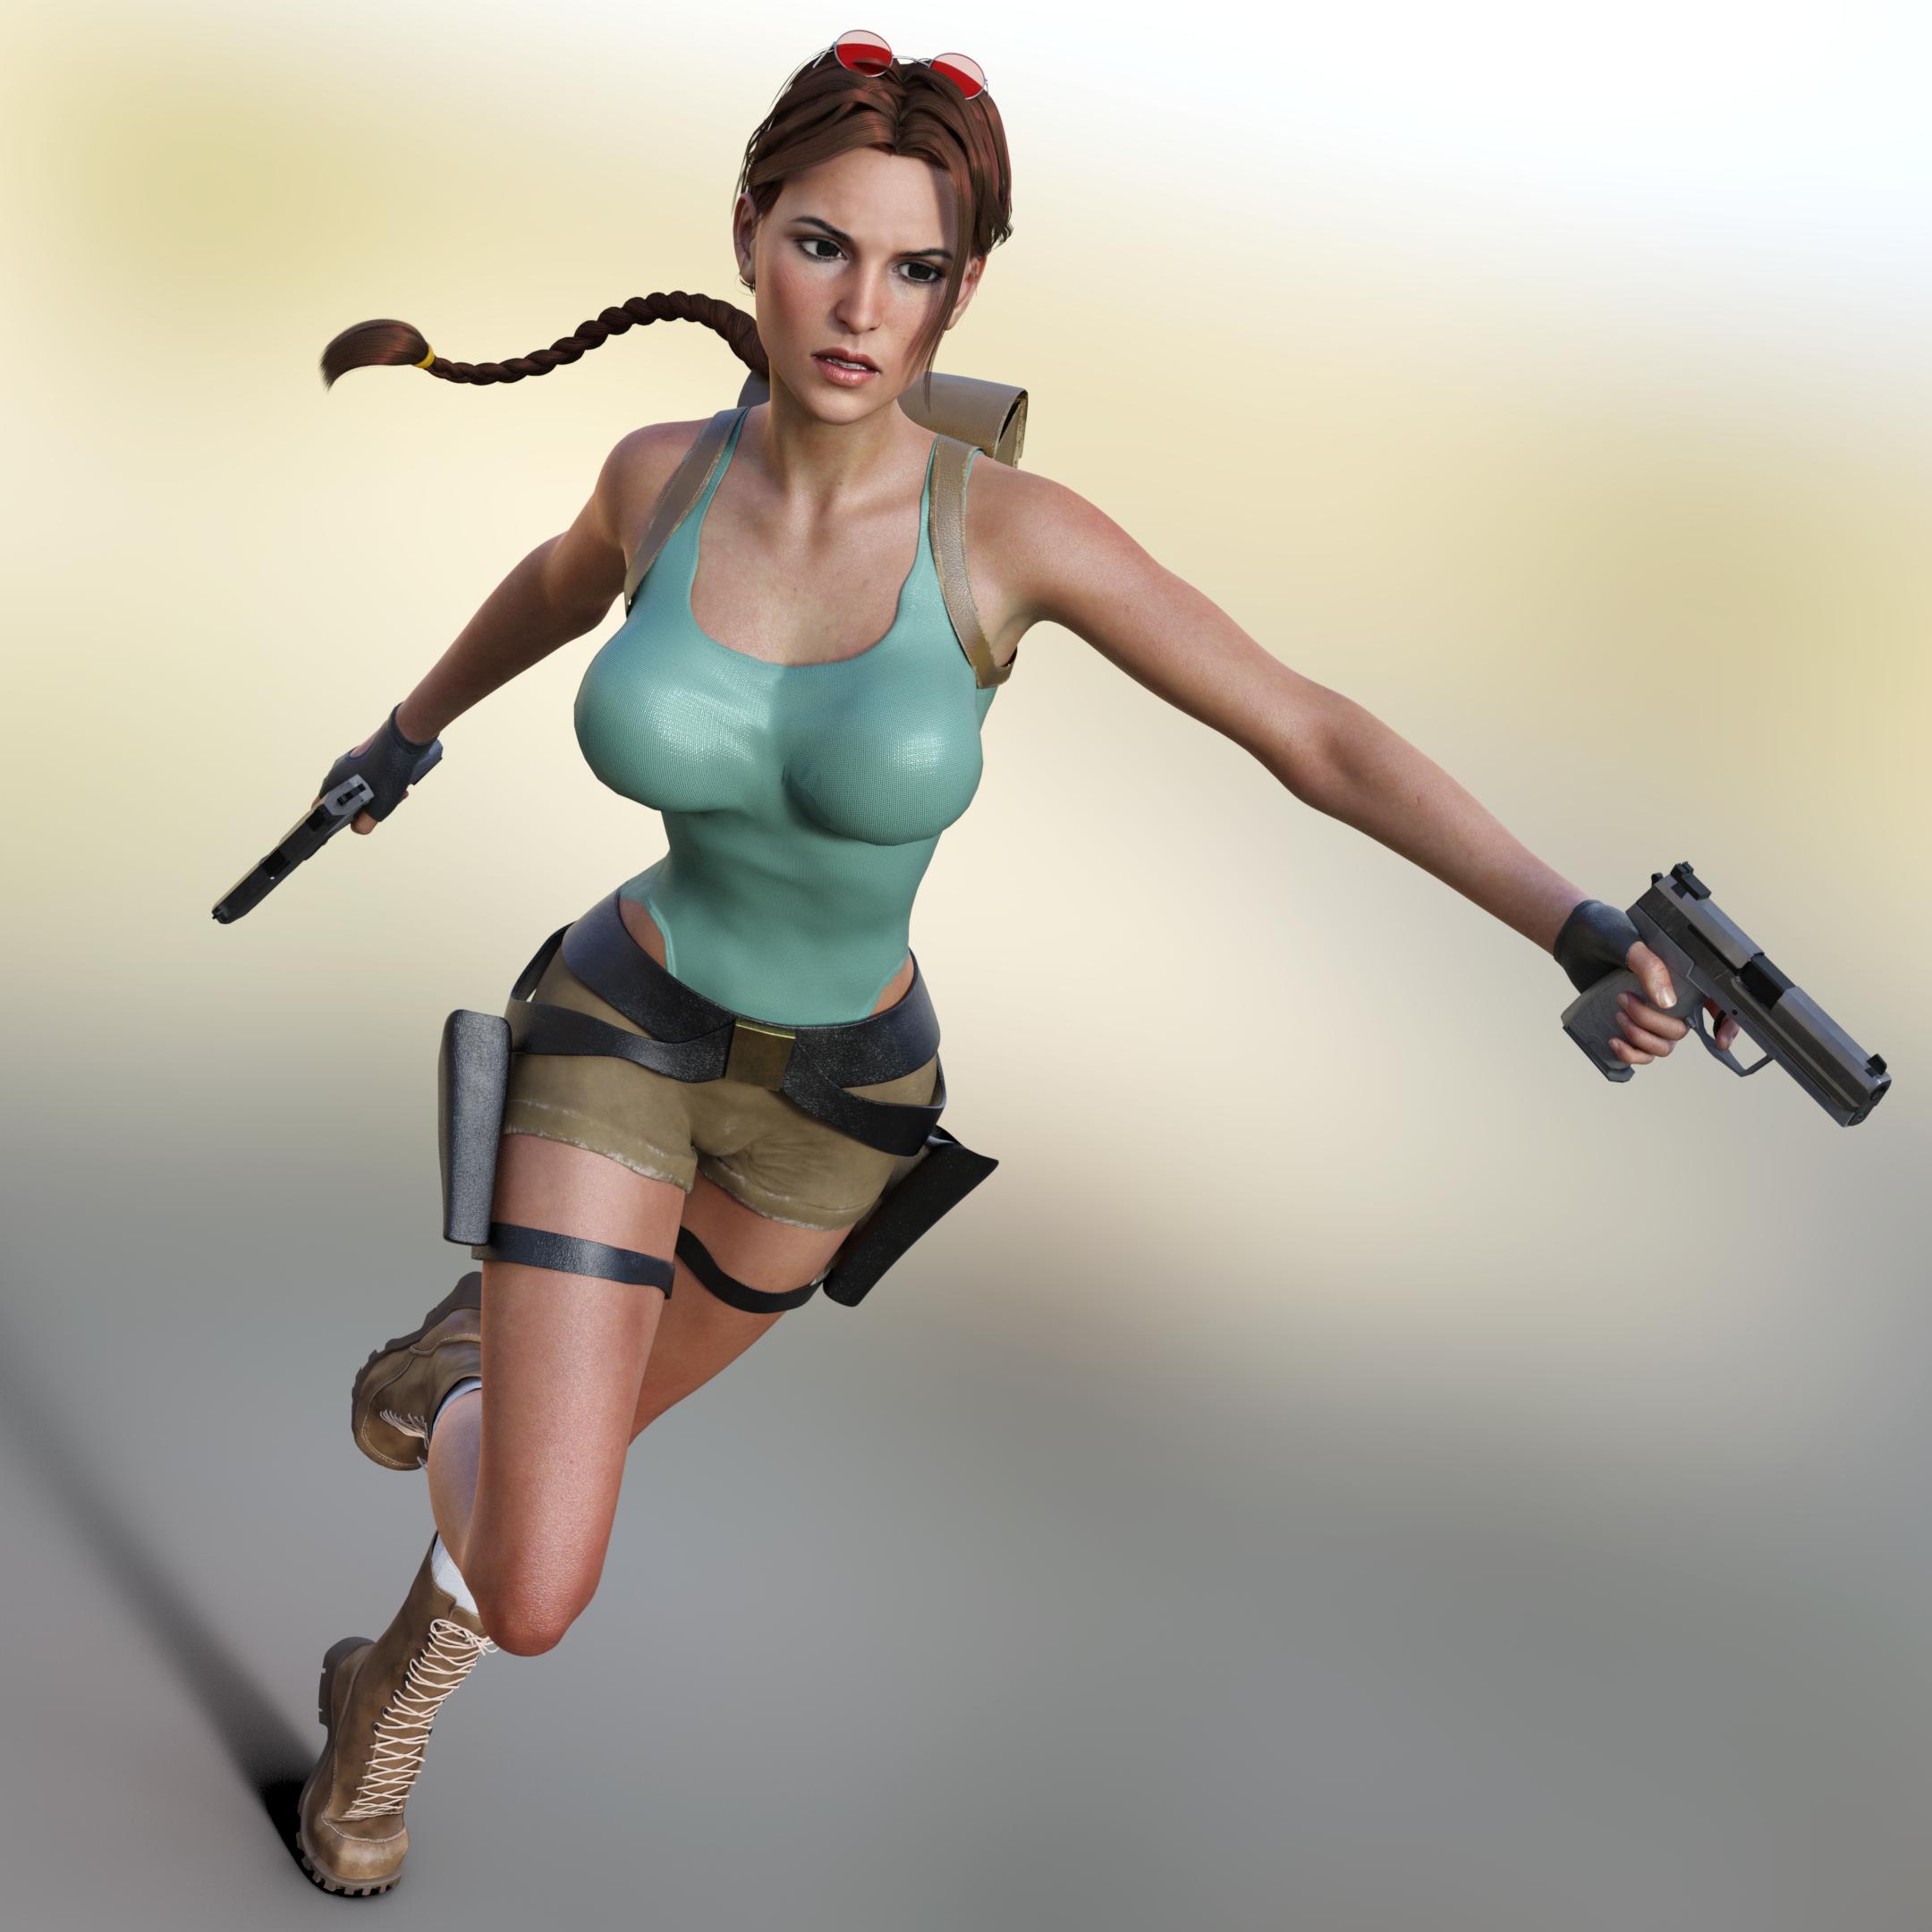 Rise Of The Tomb Raider Art Silk Fabric: Tombraider4evers Fmv Lara Model